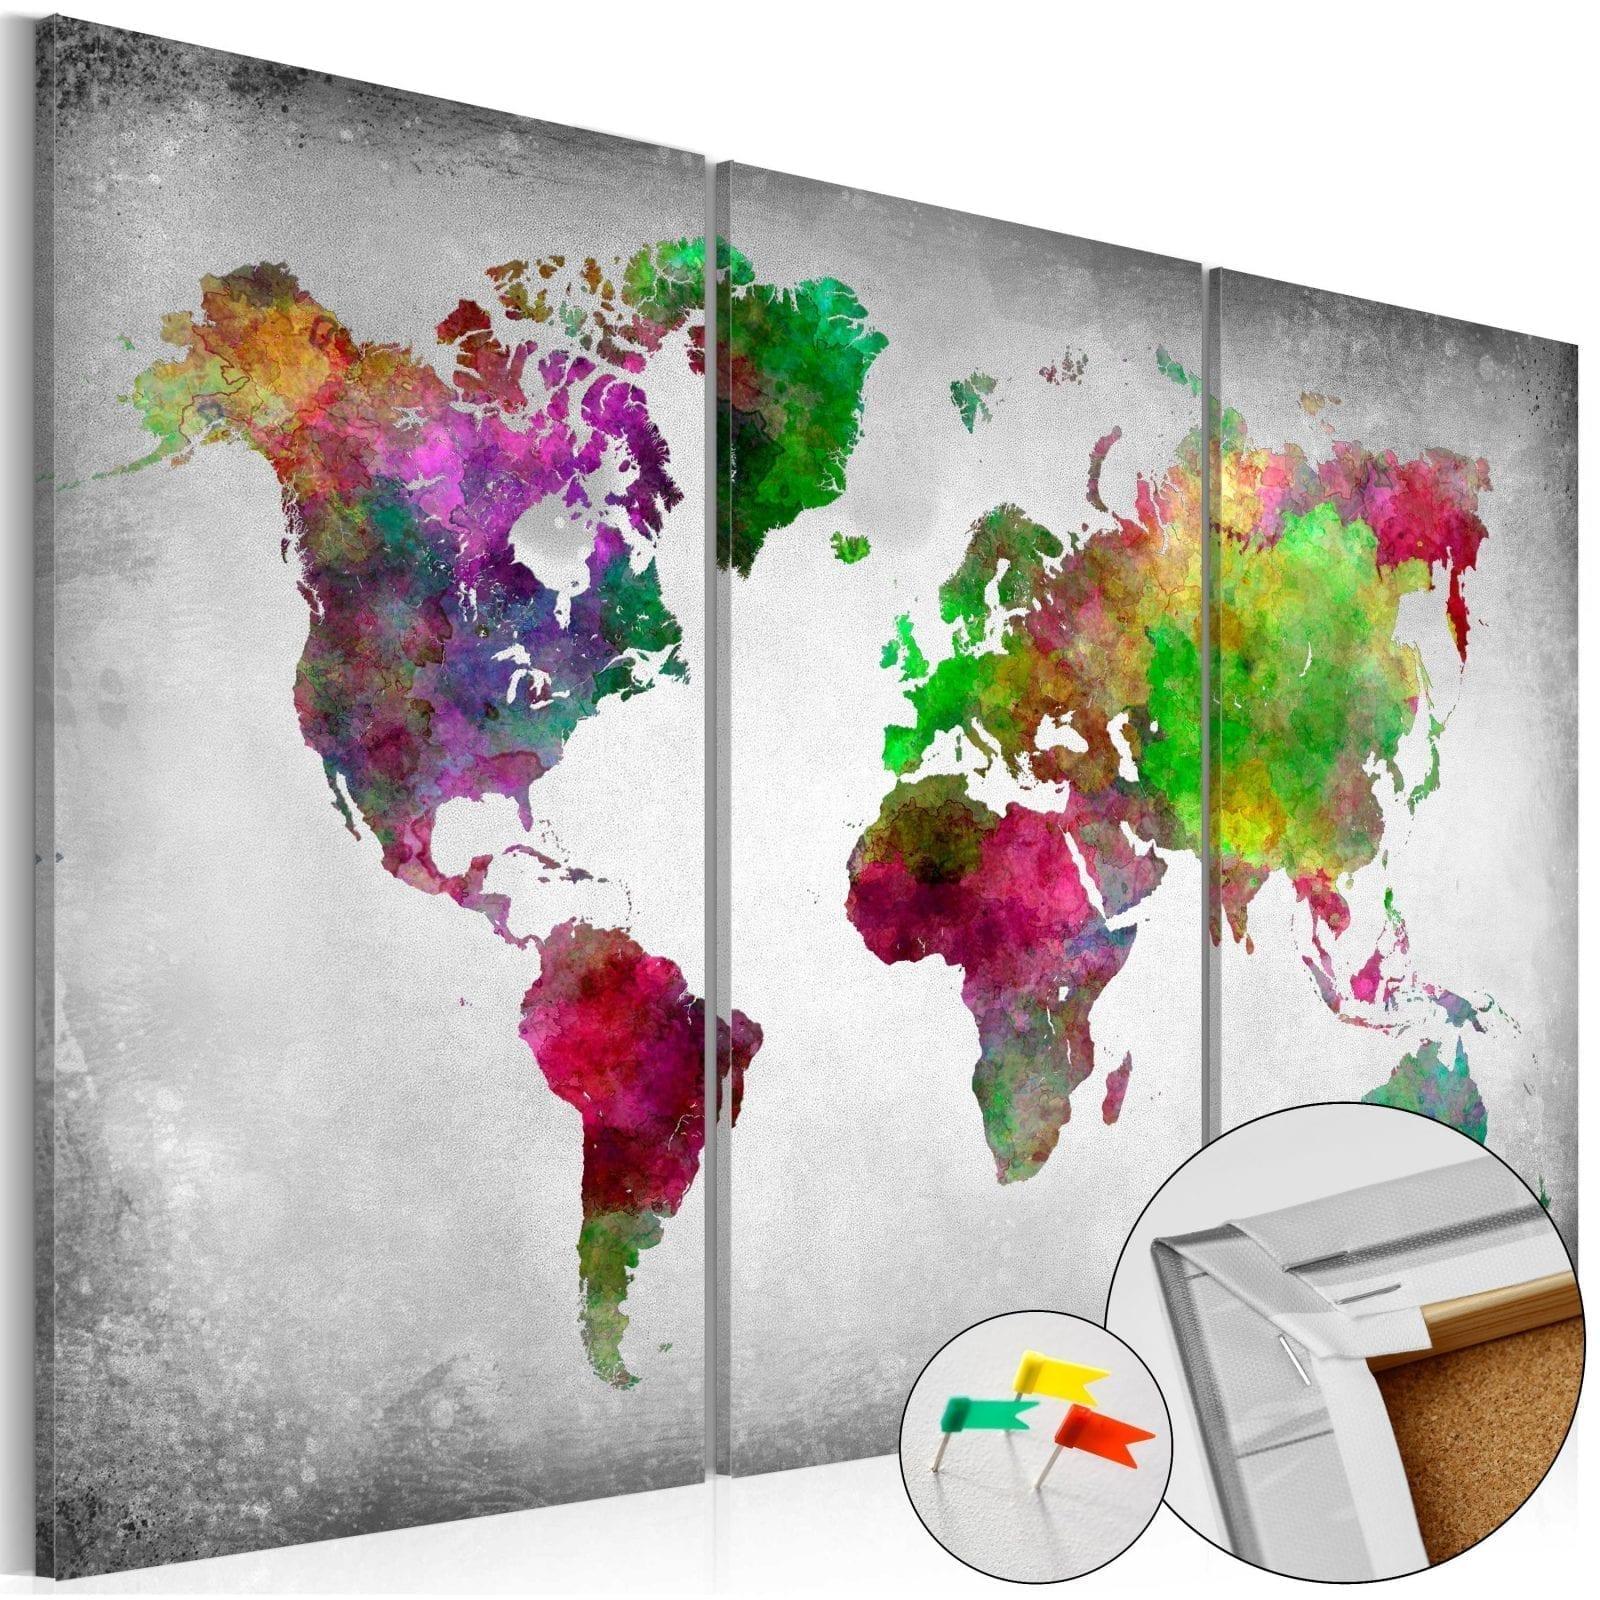 Tablero de corcho - Diversity of World 1 | Potspintura.com